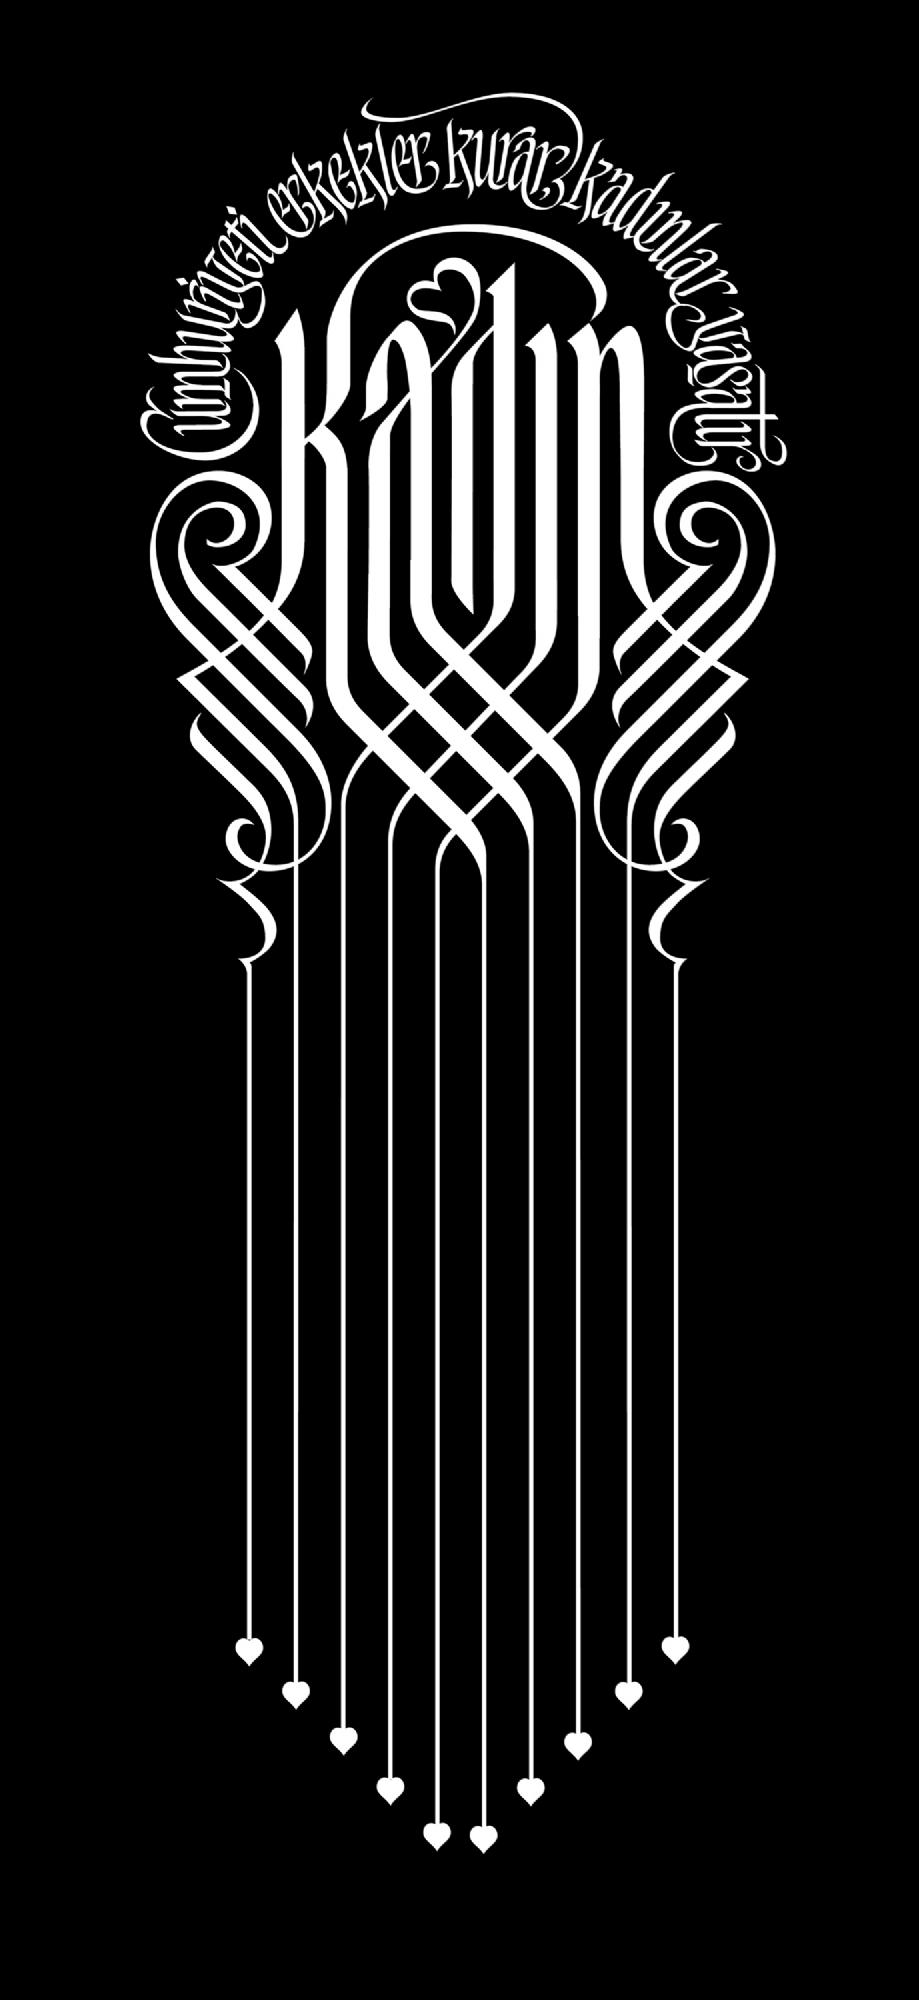 "<p>""Kadın"", Vektörel Kaligrafi, 18 x 40 cm, Anonim Atasözü.<br /><em>'Woman', Vector Calligraphy, 18 x 40 cm, Anonymous Proverb.</em></p>"